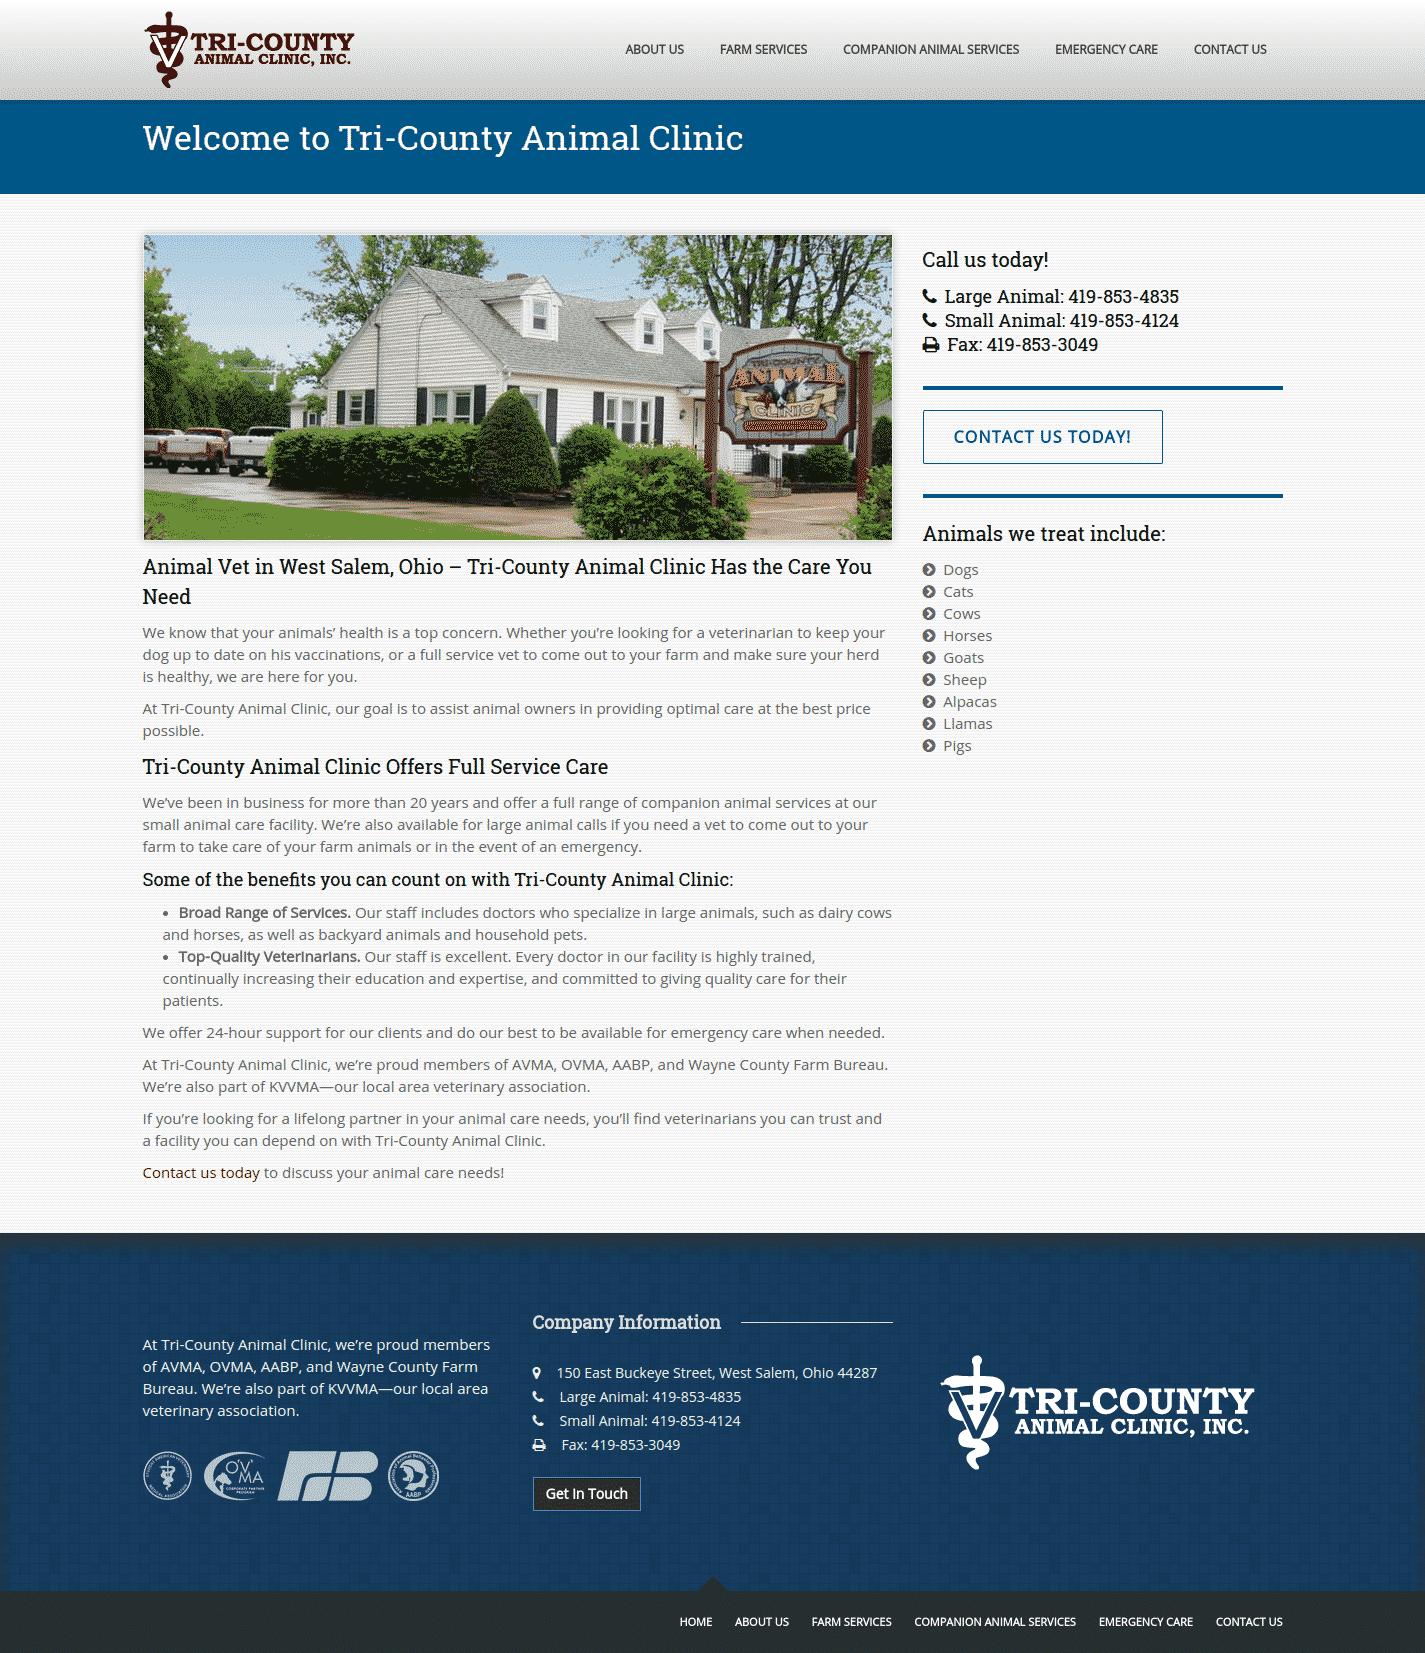 tri-county animal clinic incwebsite image